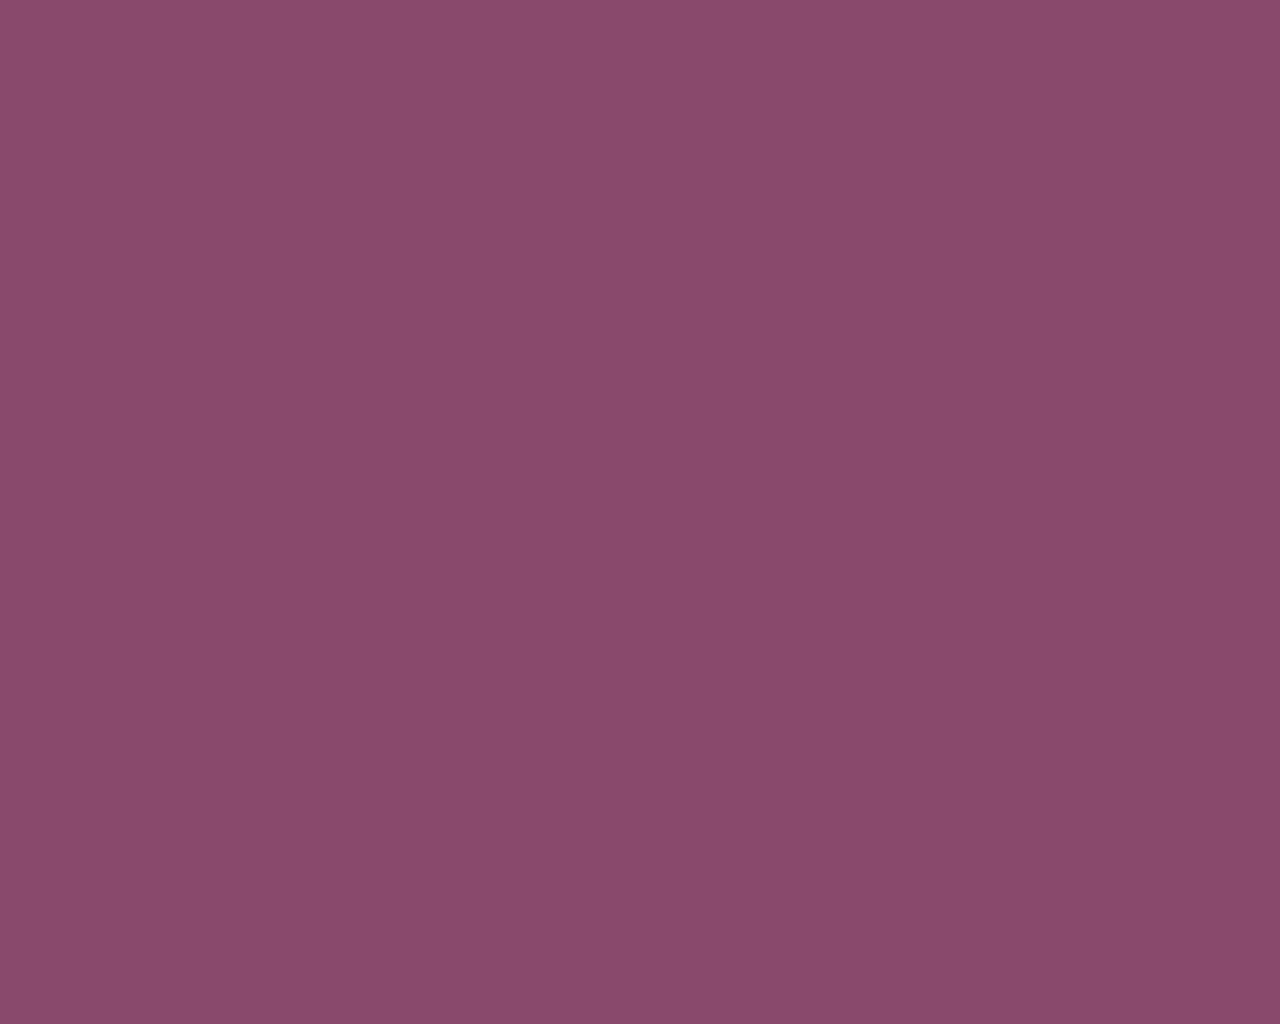 1280x1024 Twilight Lavender Solid Color Background